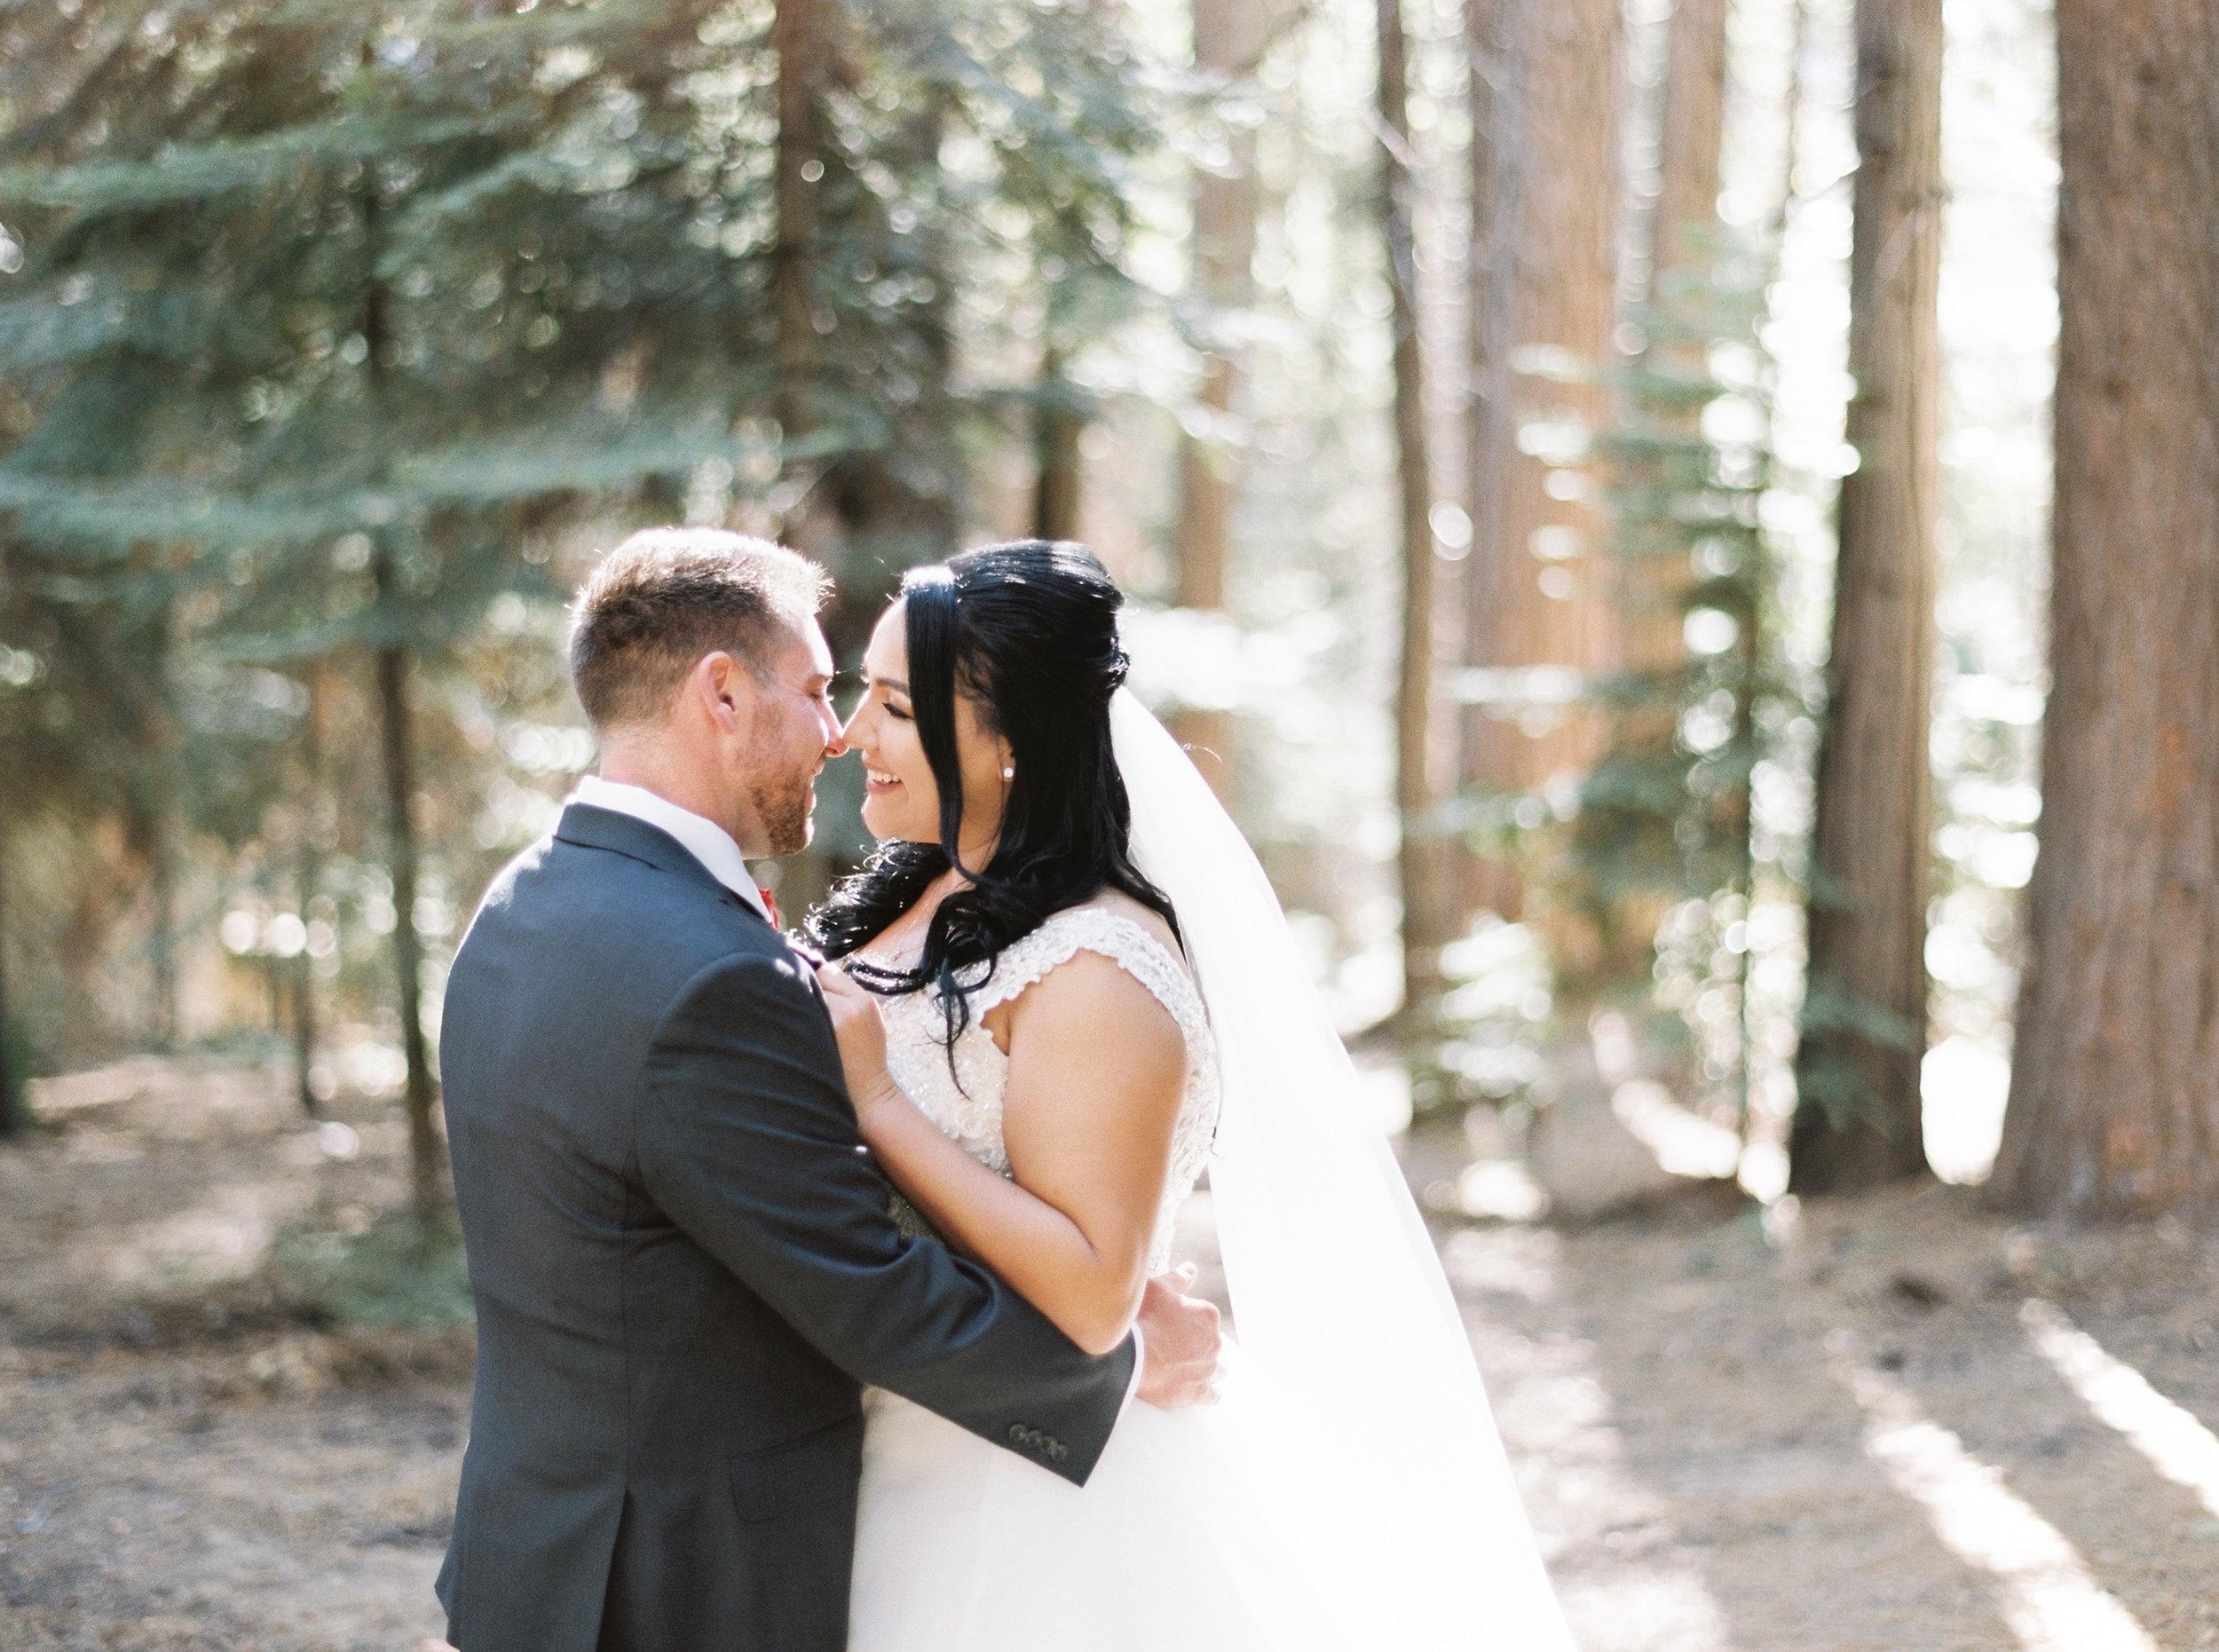 Tenaya-lodge-wedding-at-yosemite-national-park-california-27.jpg